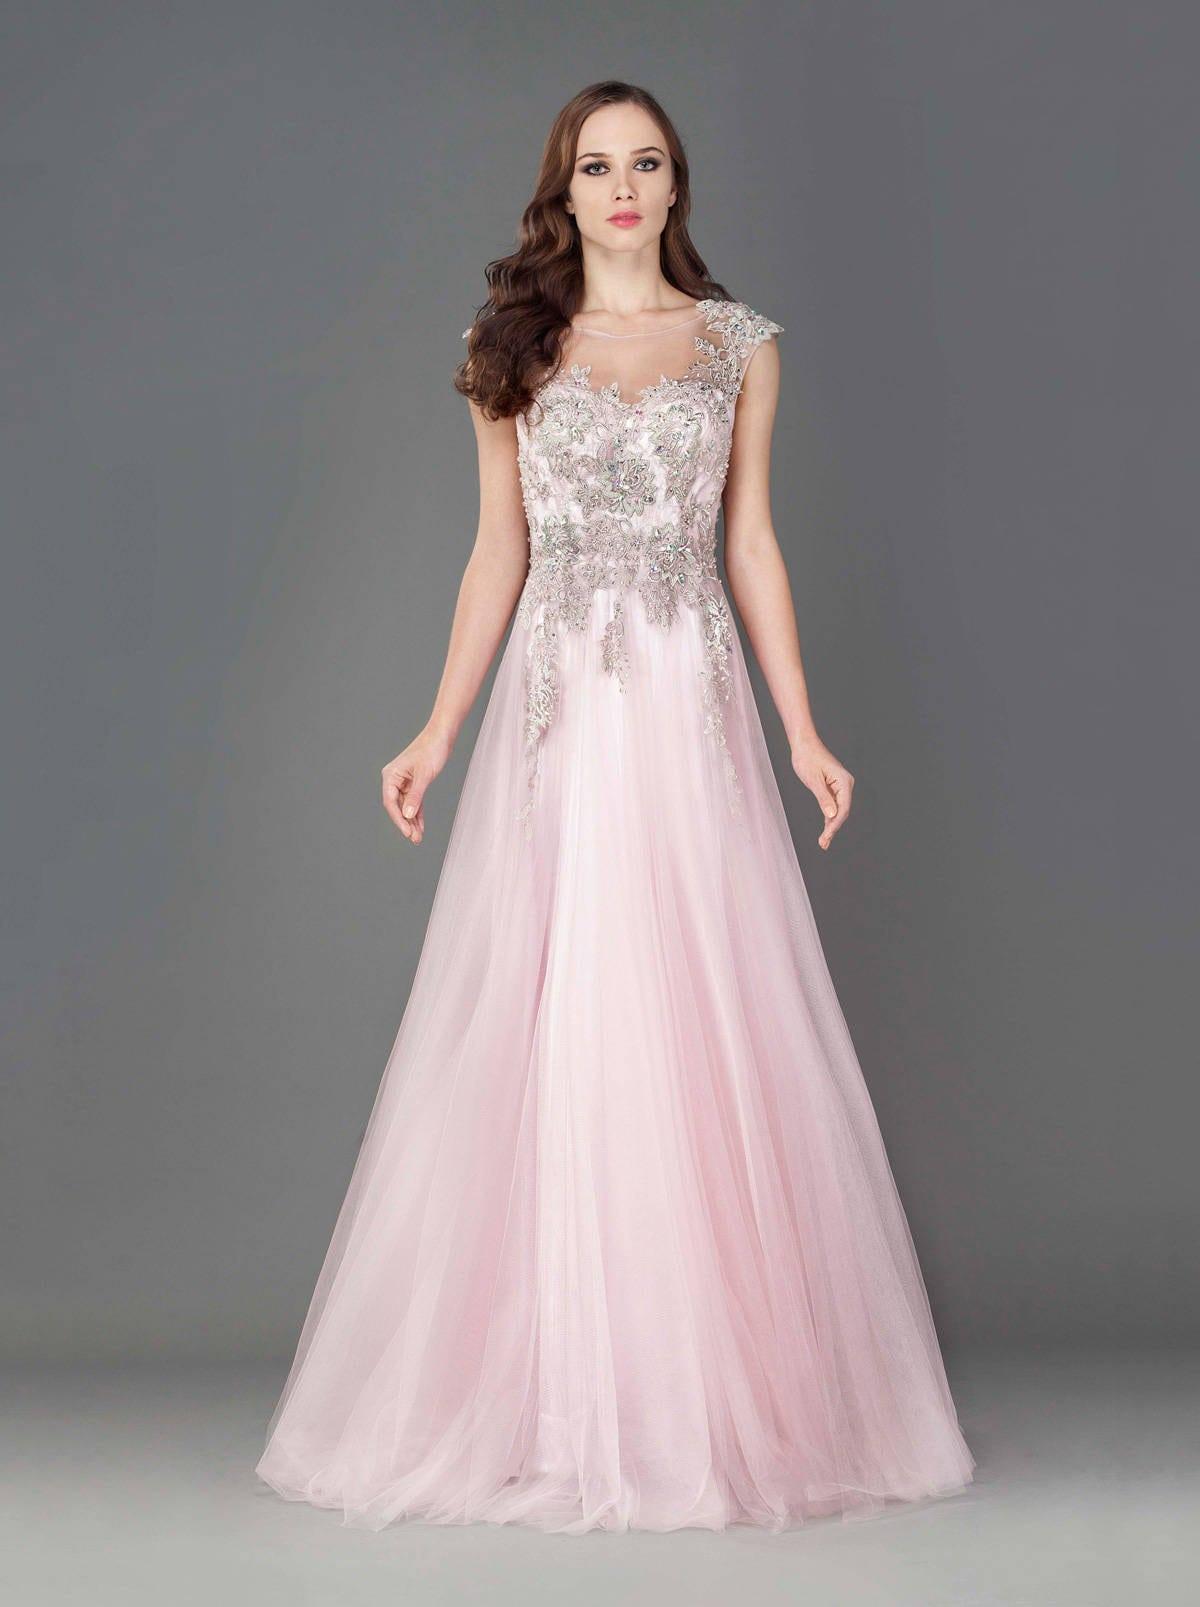 6263123405d4 Modest Formal Dresses Mother Of The Bride